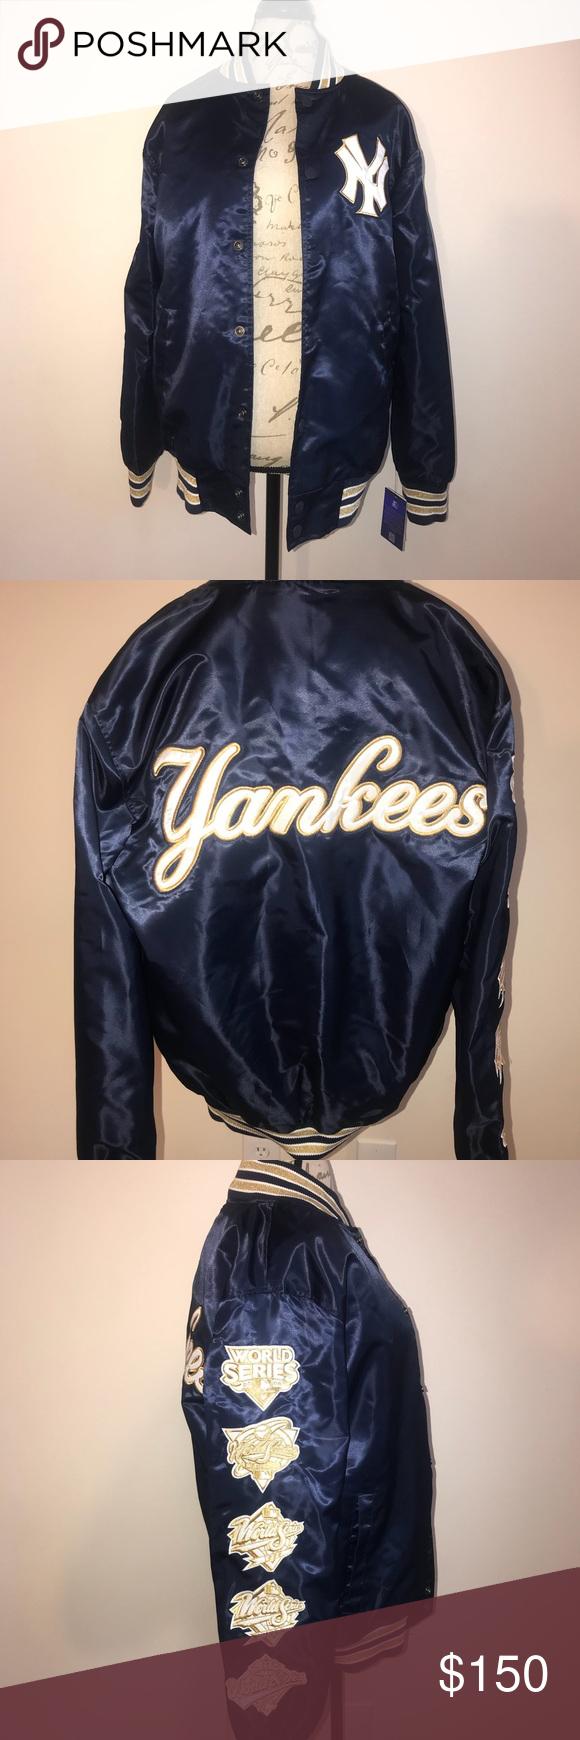 Ny Yankees Starter Jacket New Jackets Fashion Clothes Design [ 1740 x 580 Pixel ]